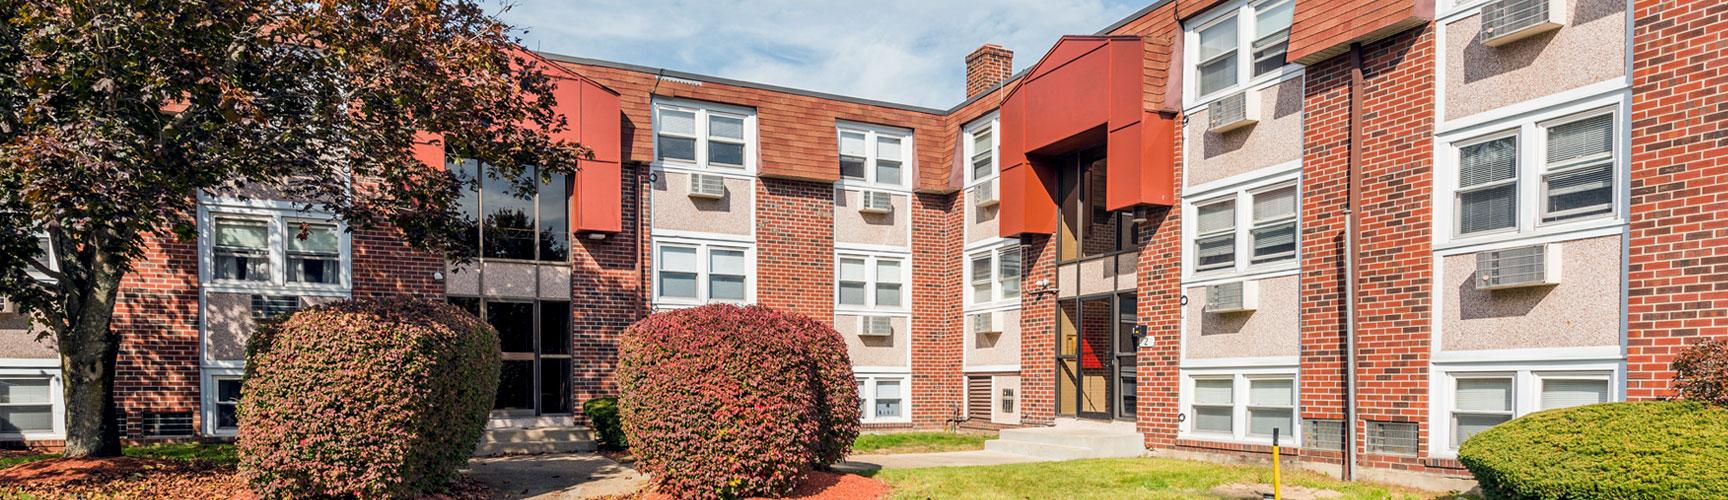 Tanglewood Village Apartments West Warwick Ri